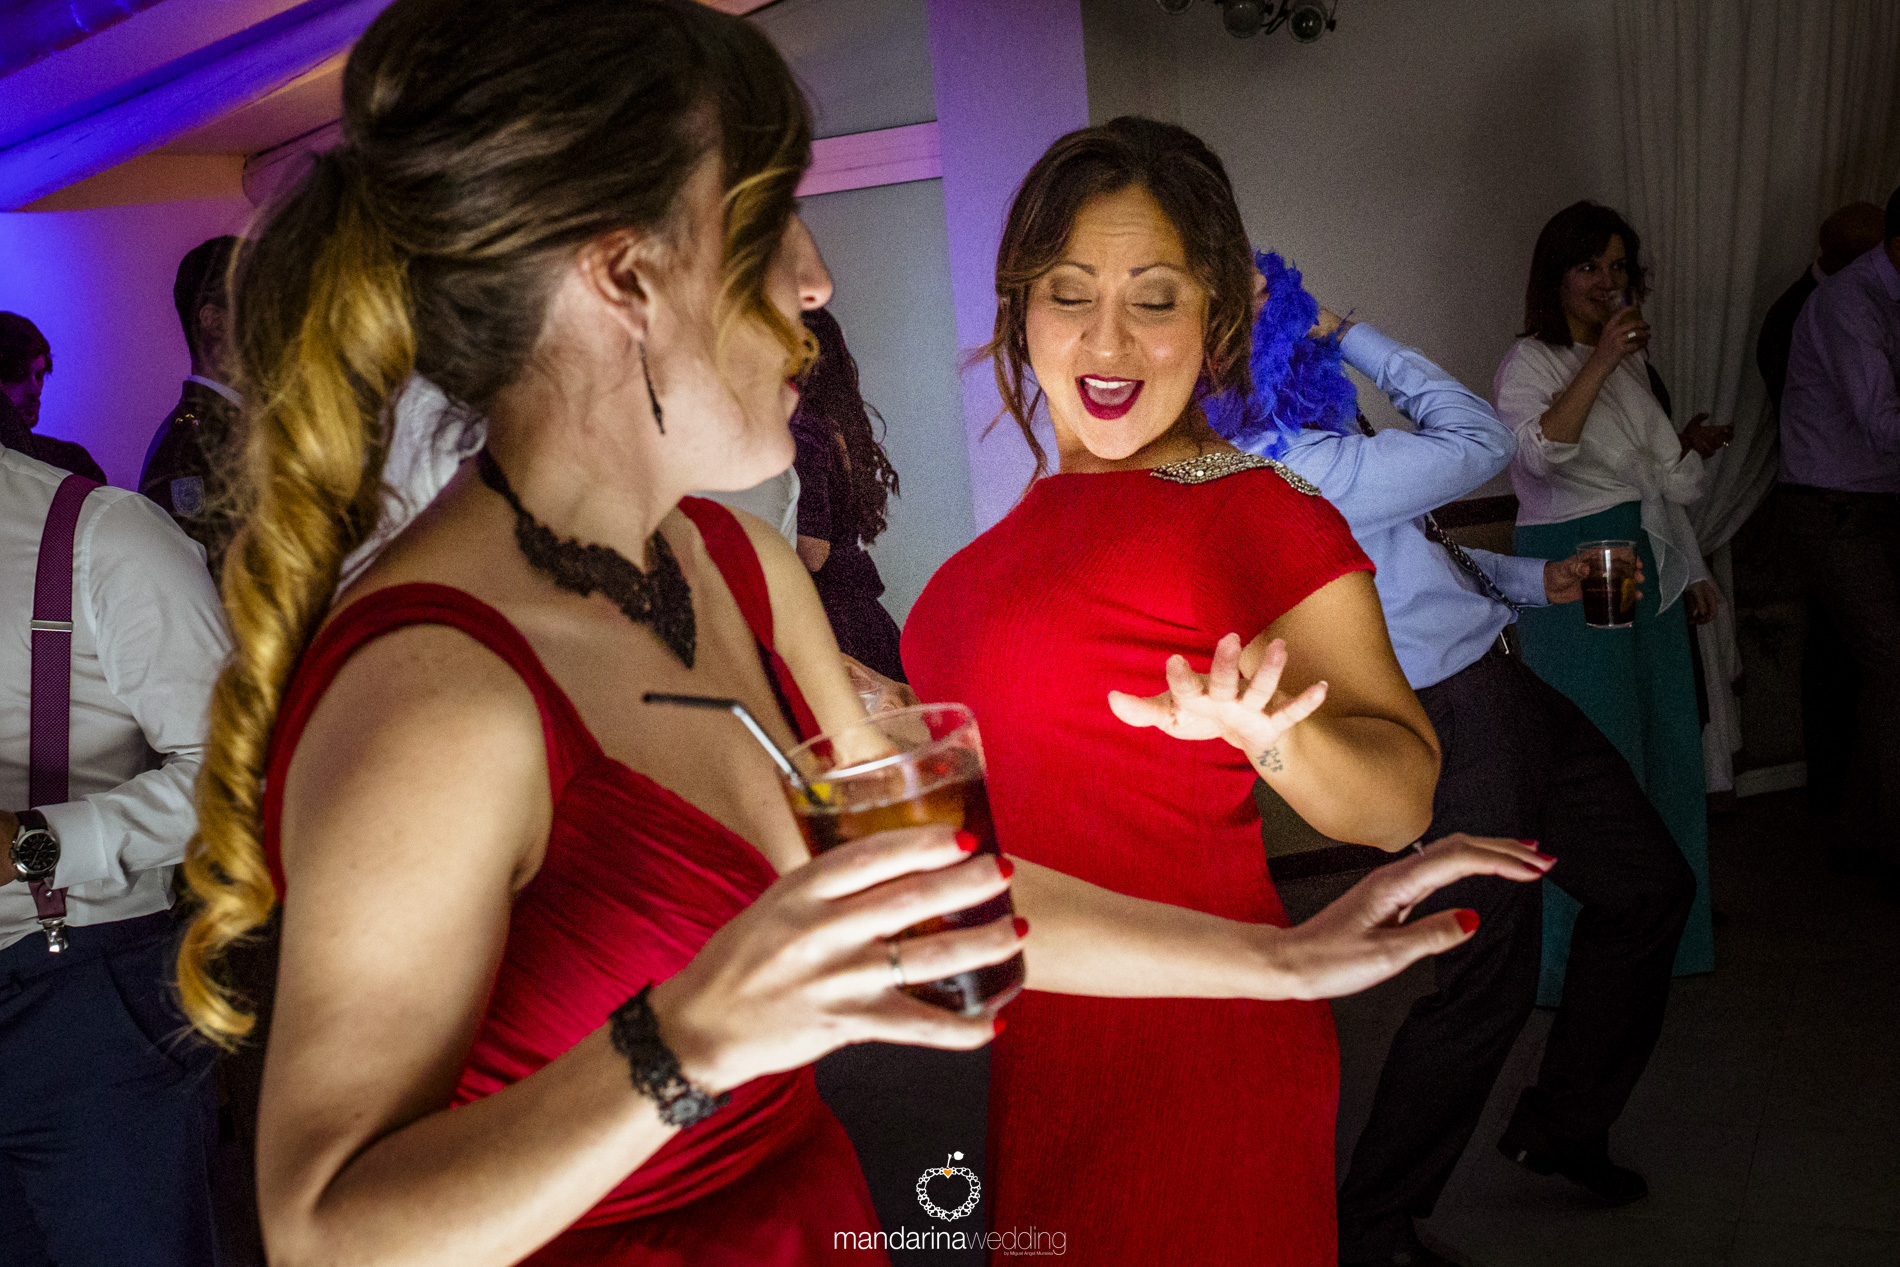 mandarina wedding, fotografos de boda, fotografo boda soria, fotografo boda barcelona, fotografo boda Madrid, fotógrafo boda lerida_27